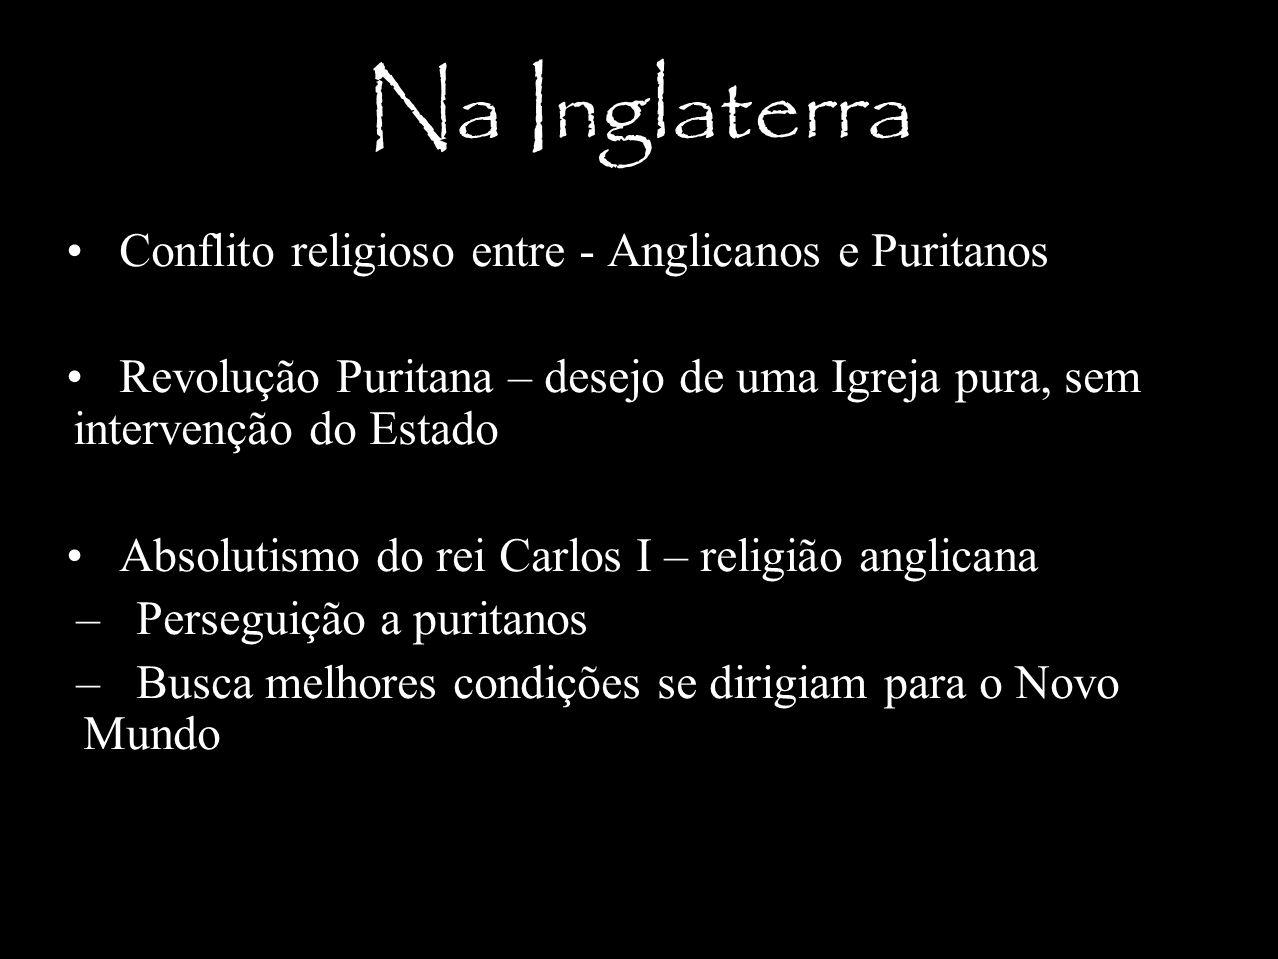 Na Inglaterra Conflito religioso entre - Anglicanos e Puritanos